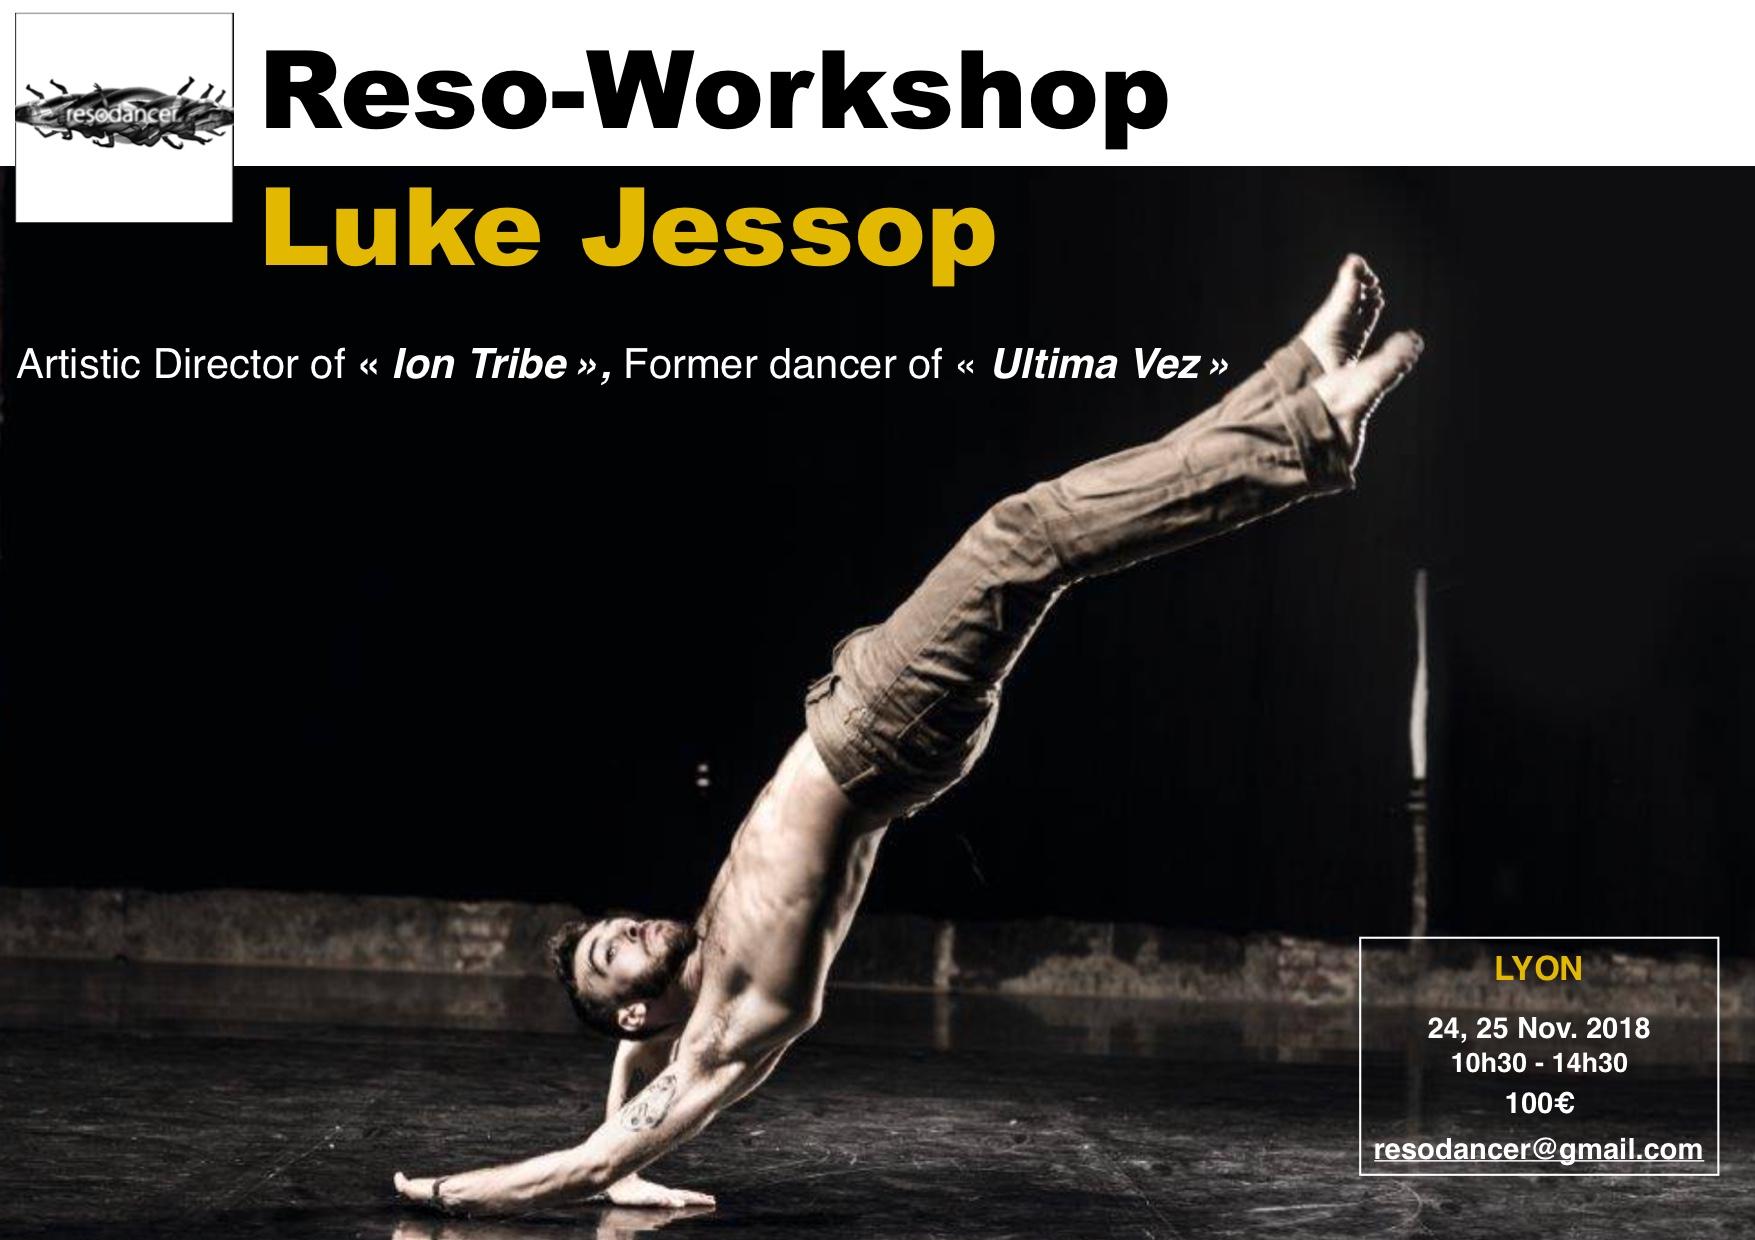 Reso-Workshop Luke Jessop